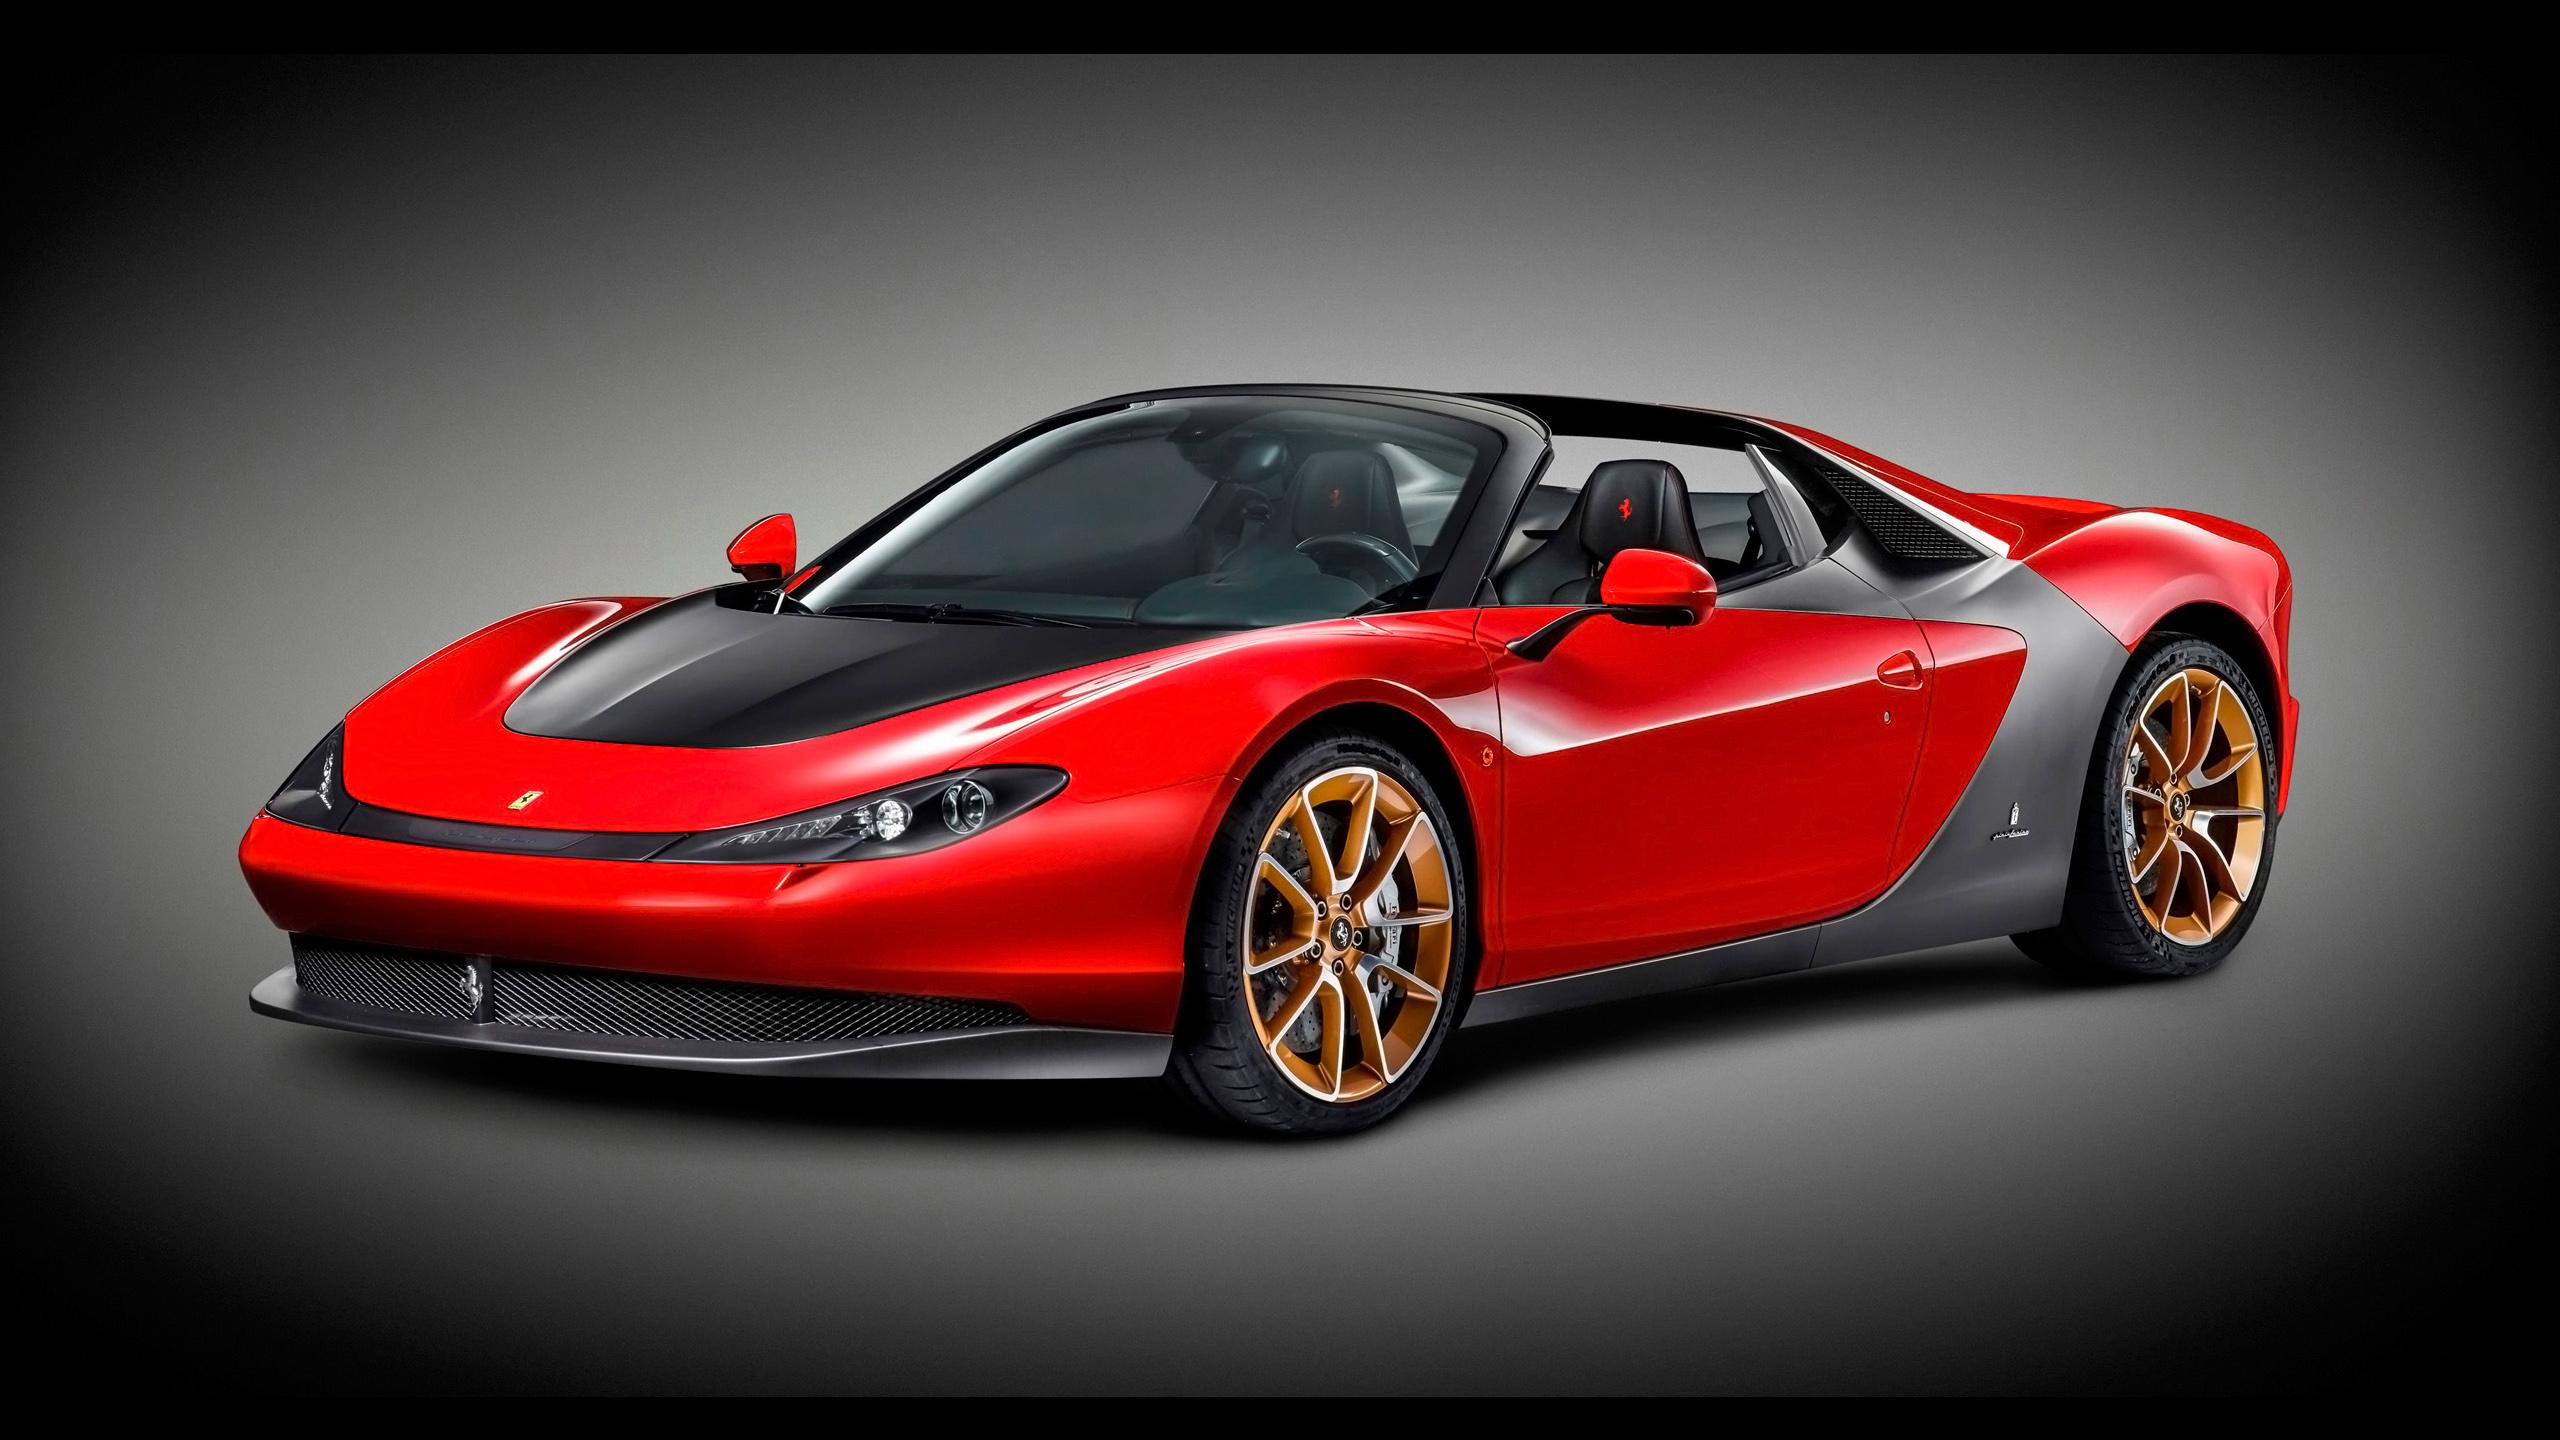 2015 Ferrari Sergio Wallpaper Hd Car Wallpapers 2560x1440 Download Hd Wallpaper Wallpapertip